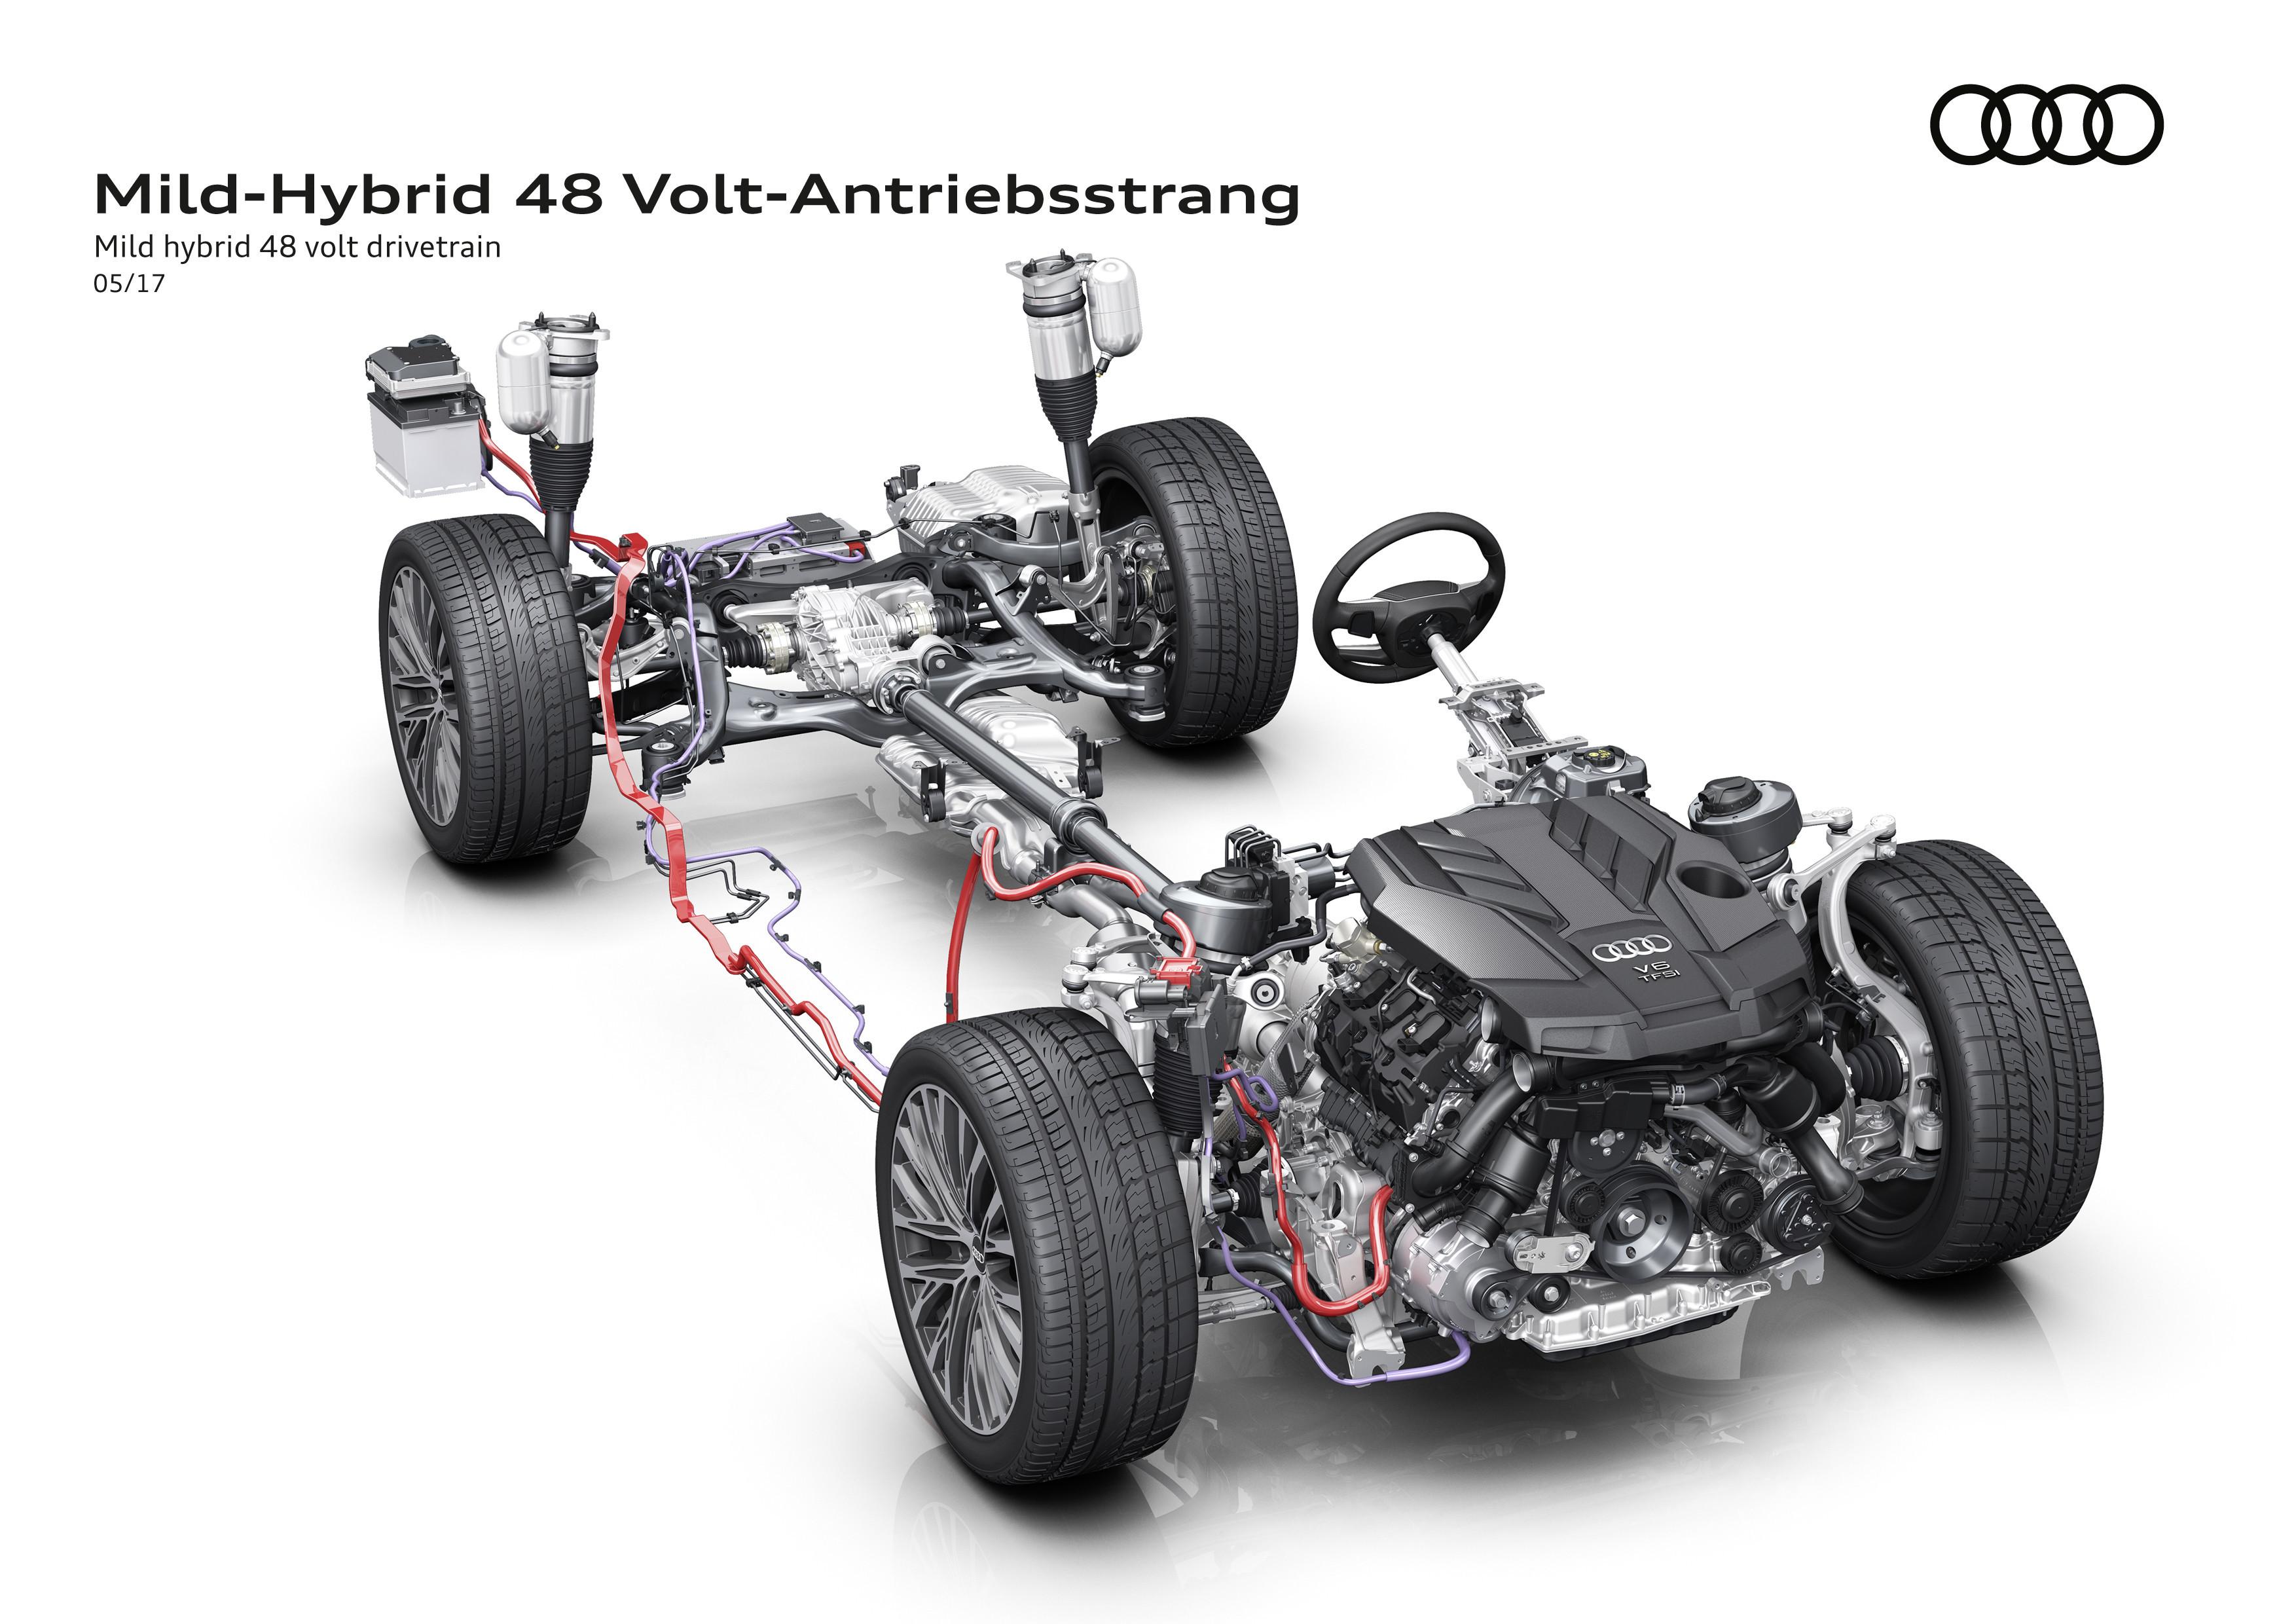 Intel Audi 4 2 Fsi High Rev To Live On In Next R8